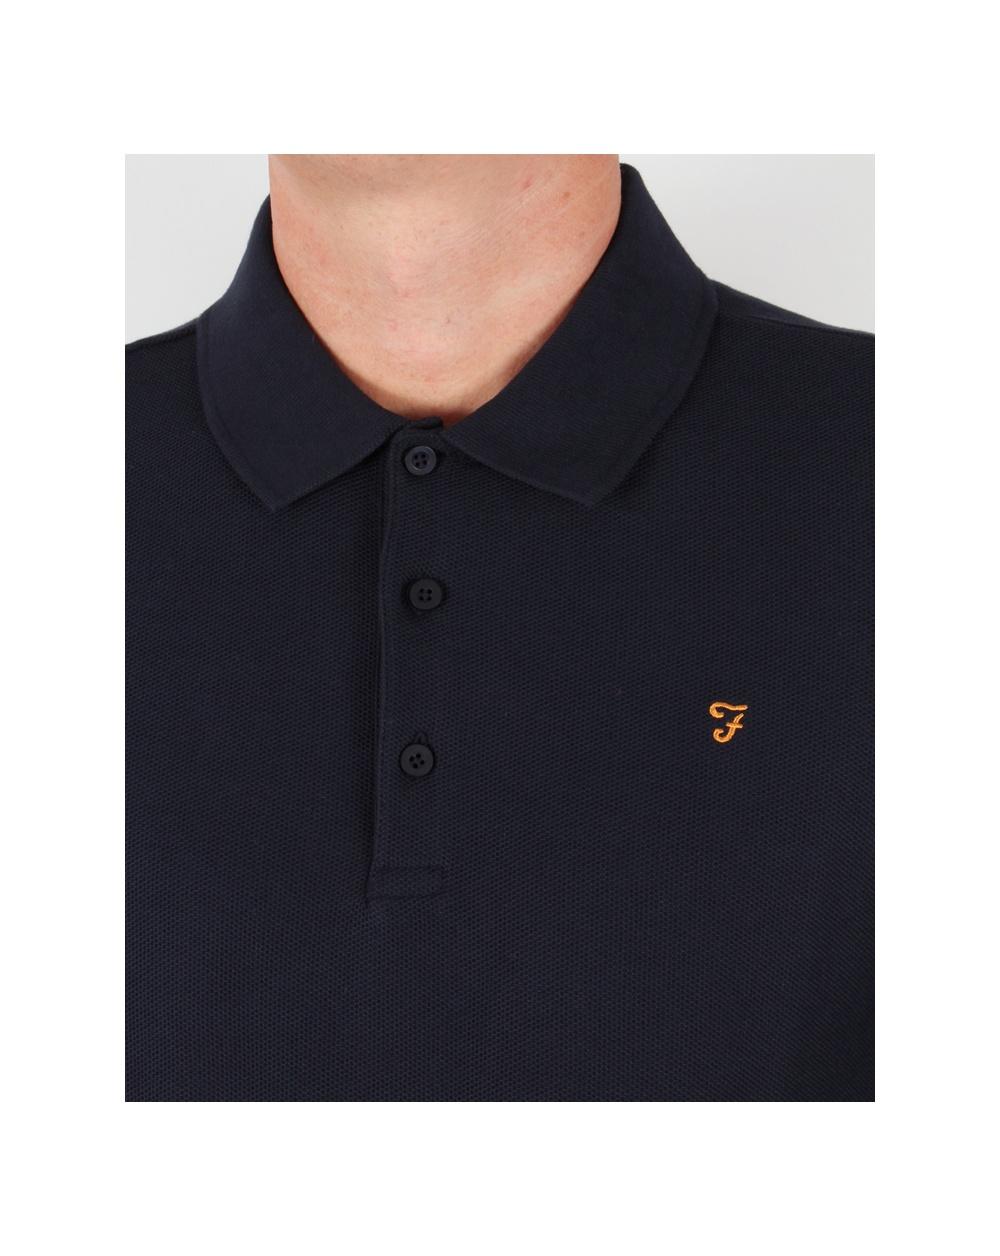 Farah Rosslyn Polo Shirt Navy Blue Long Sleeve Cotton Mens